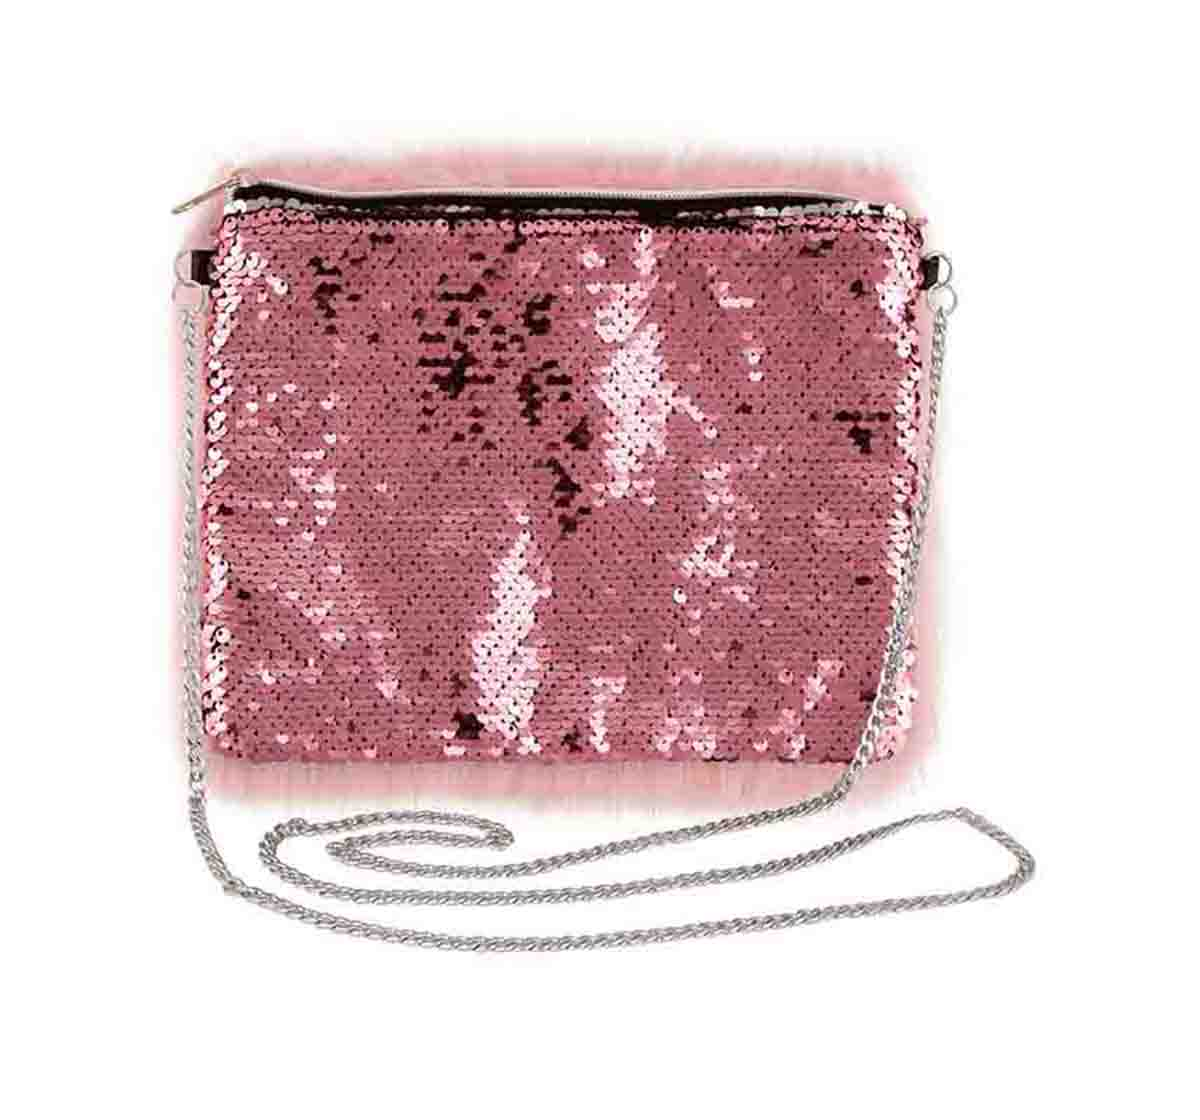 Fashion Angels | NE FA Faux Fur & Magic Sequin Pink Bag